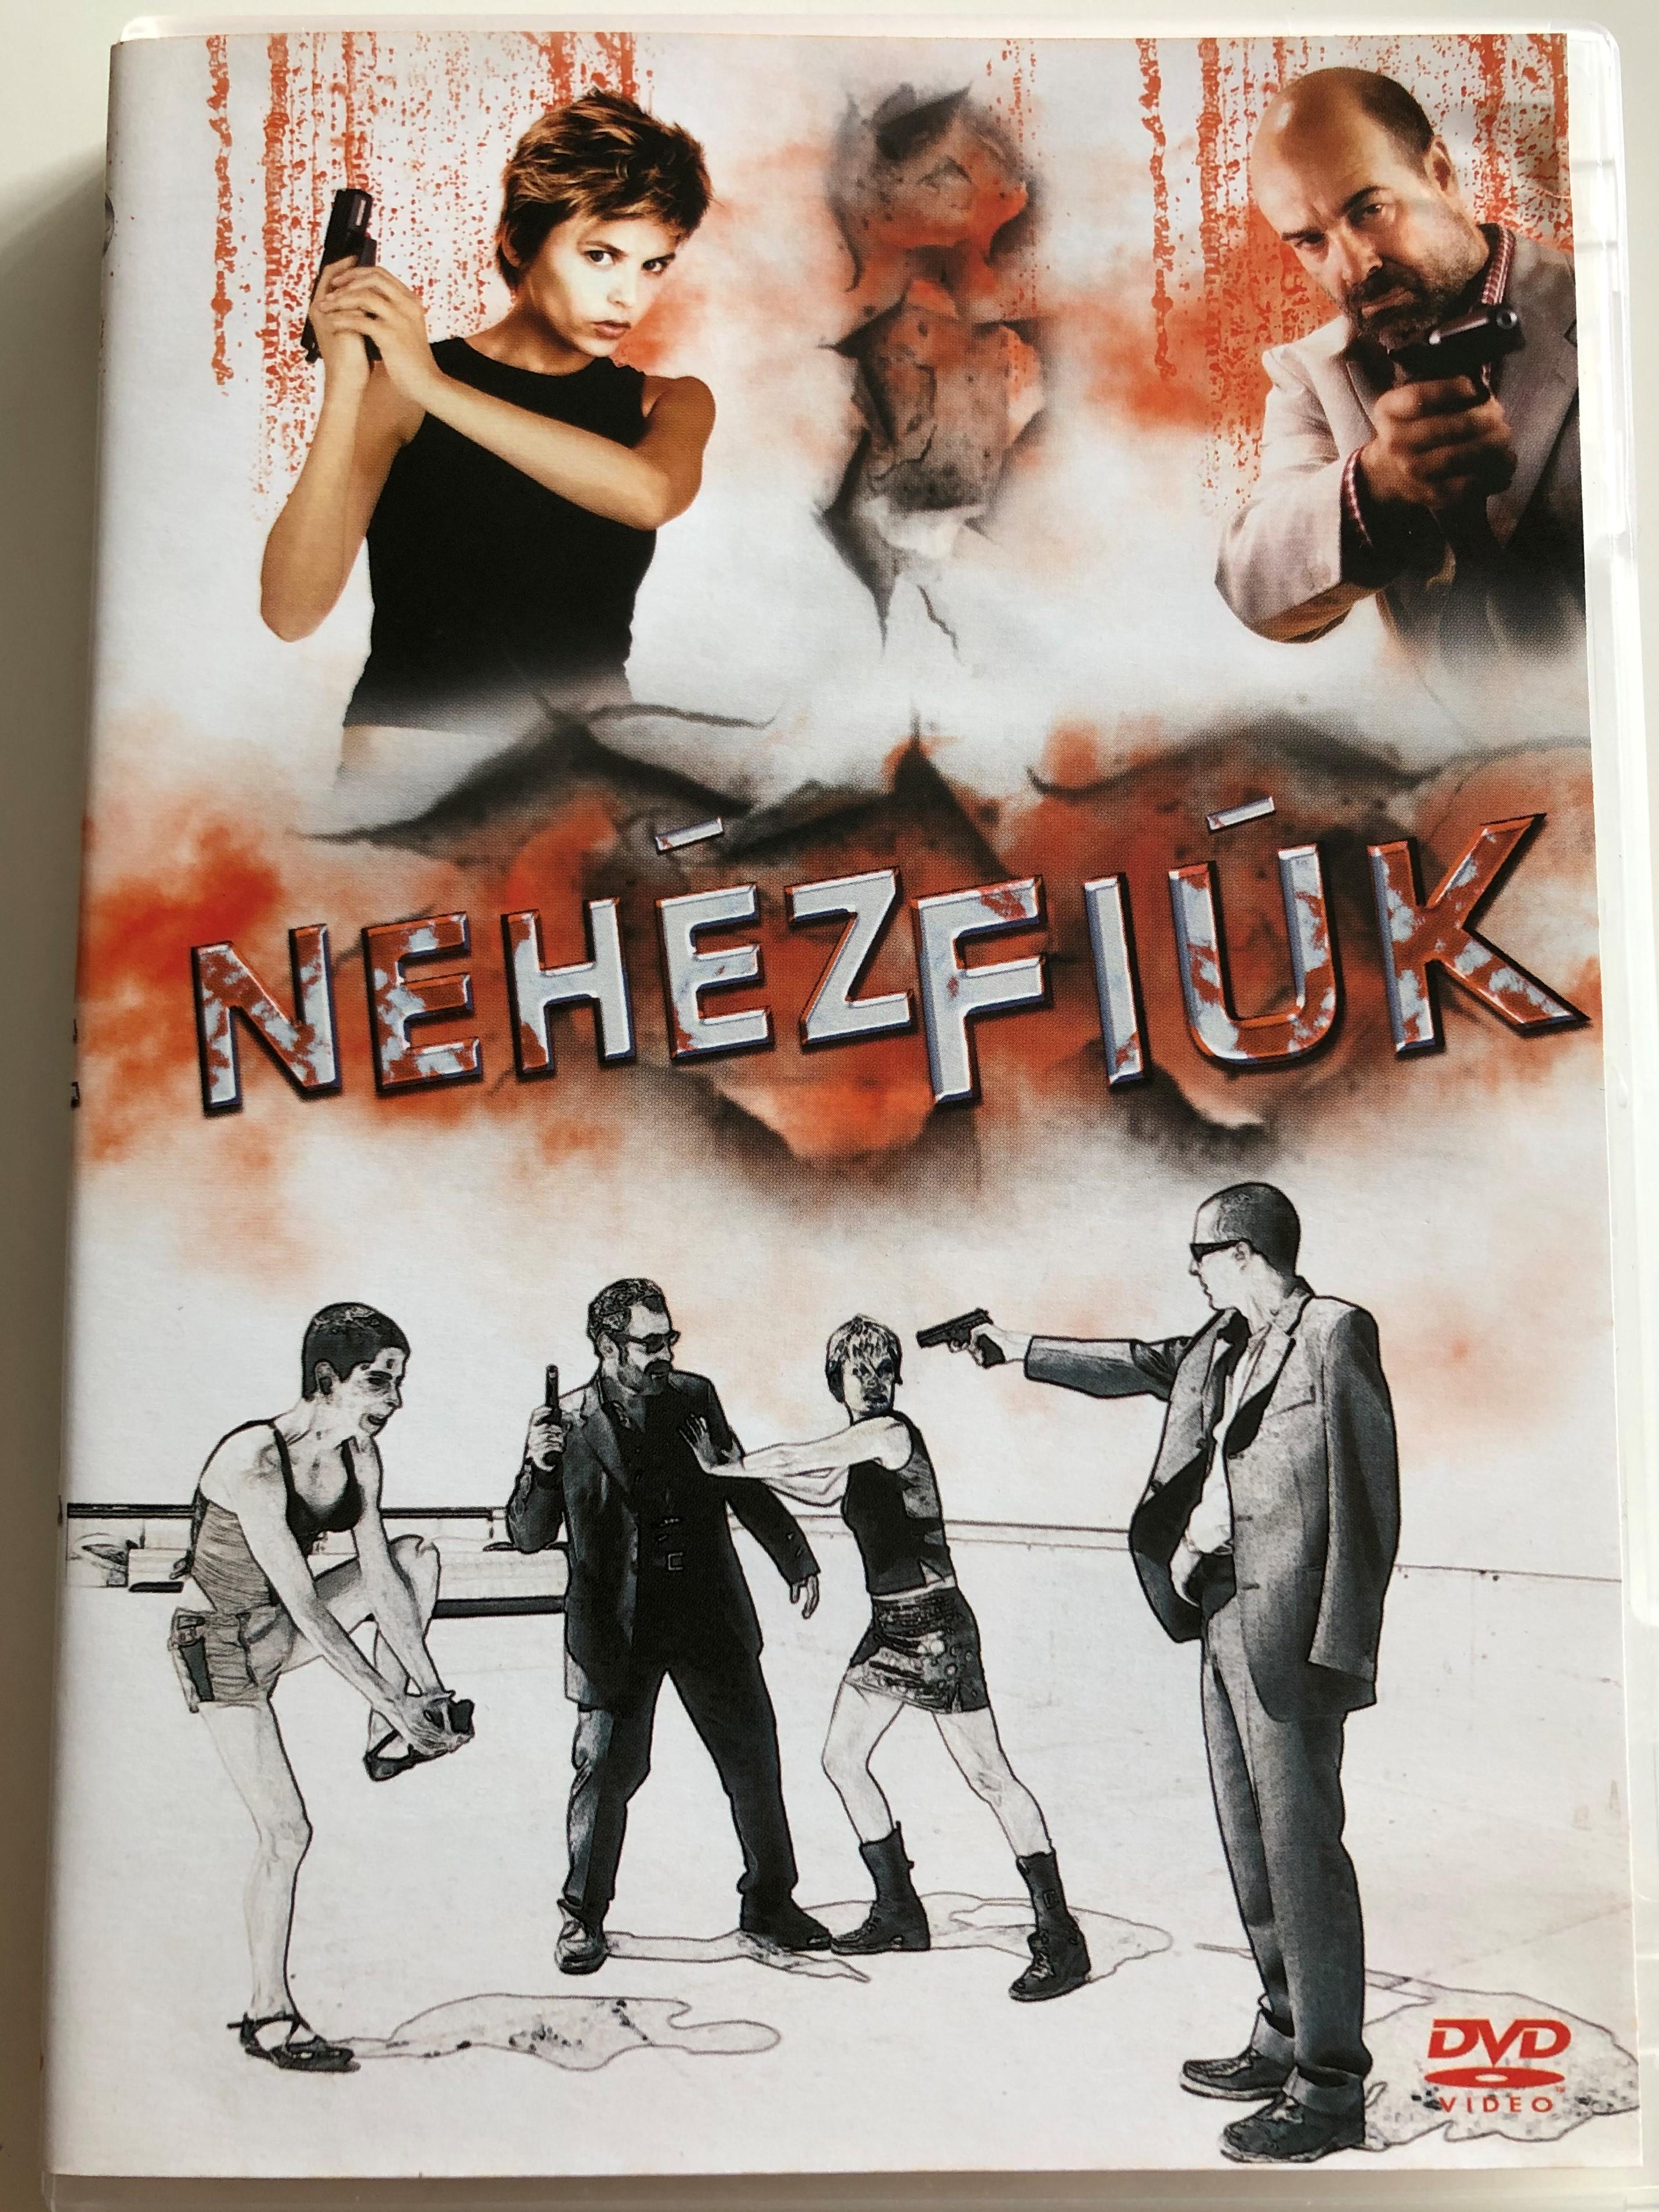 dos-tipos-duros-dvd-2003-neh-z-fi-k-directed-by-juan-mart-nez-moreno-starring-antonio-resines-manuel-alexandre-jordi-vilches-1-.jpg